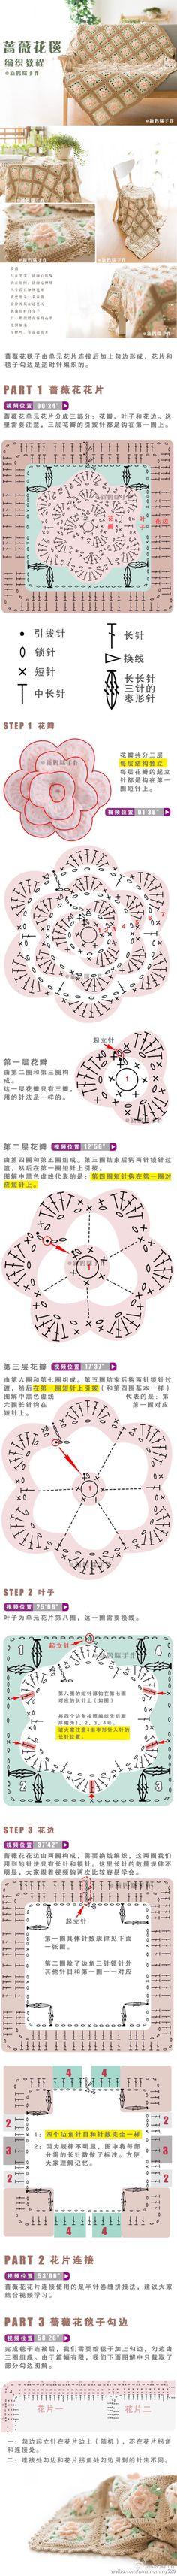 http://www.duitang.com/album/?id=71107098&spm=2014.12553688.202.0 Красивые пледы крючком КИТАЙ